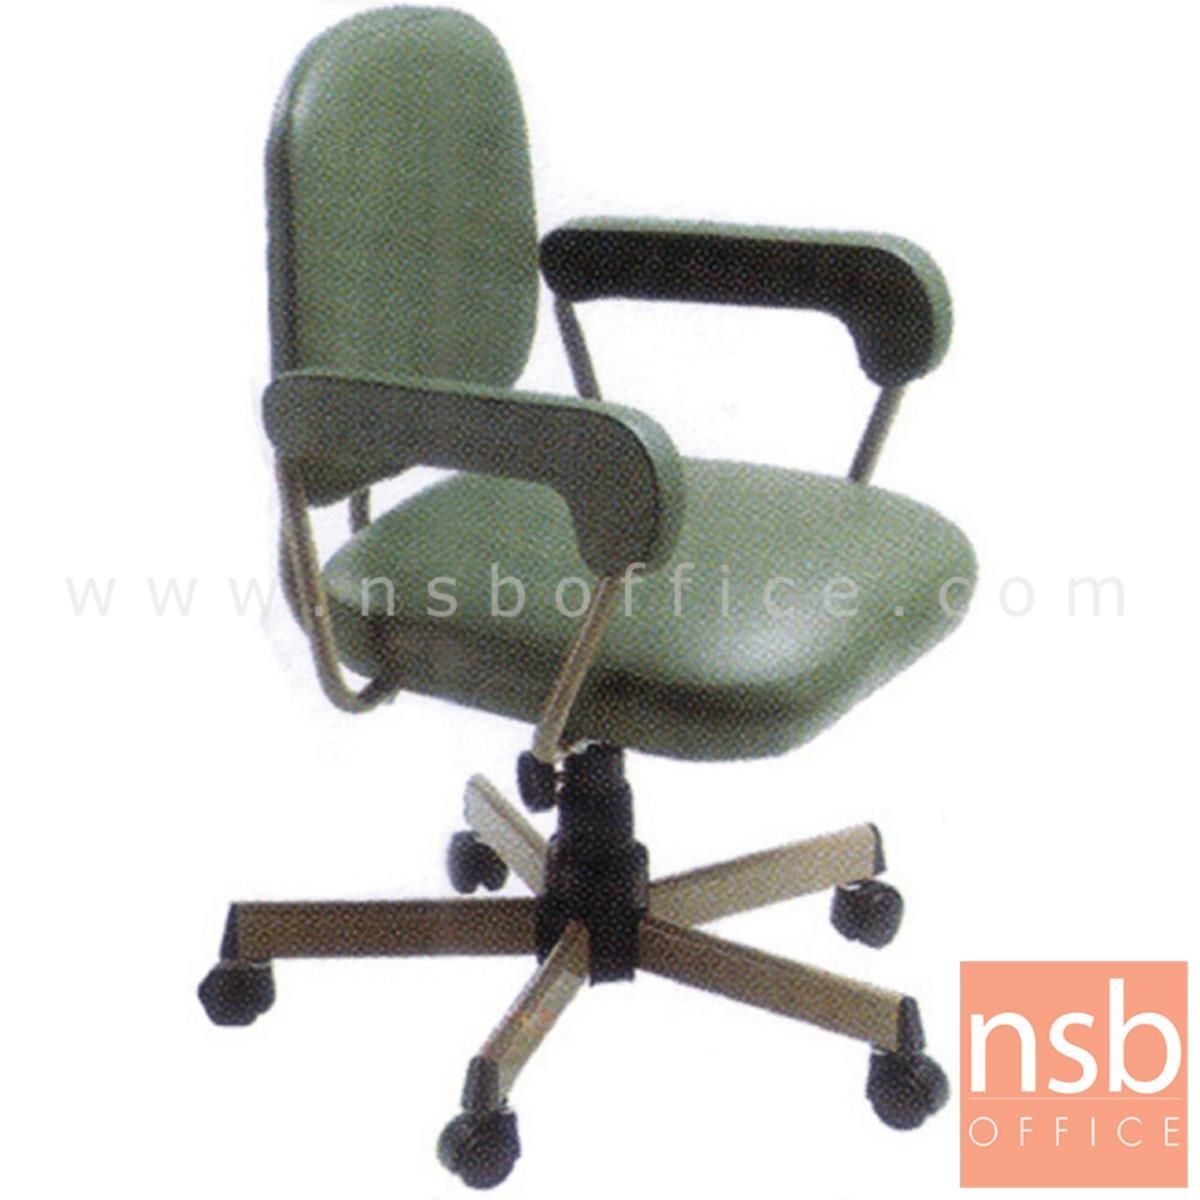 E28A083:เก้าอี้สำนักงาน รุ่น CH-400  ขาเหล็กชุบโครเมี่ยม